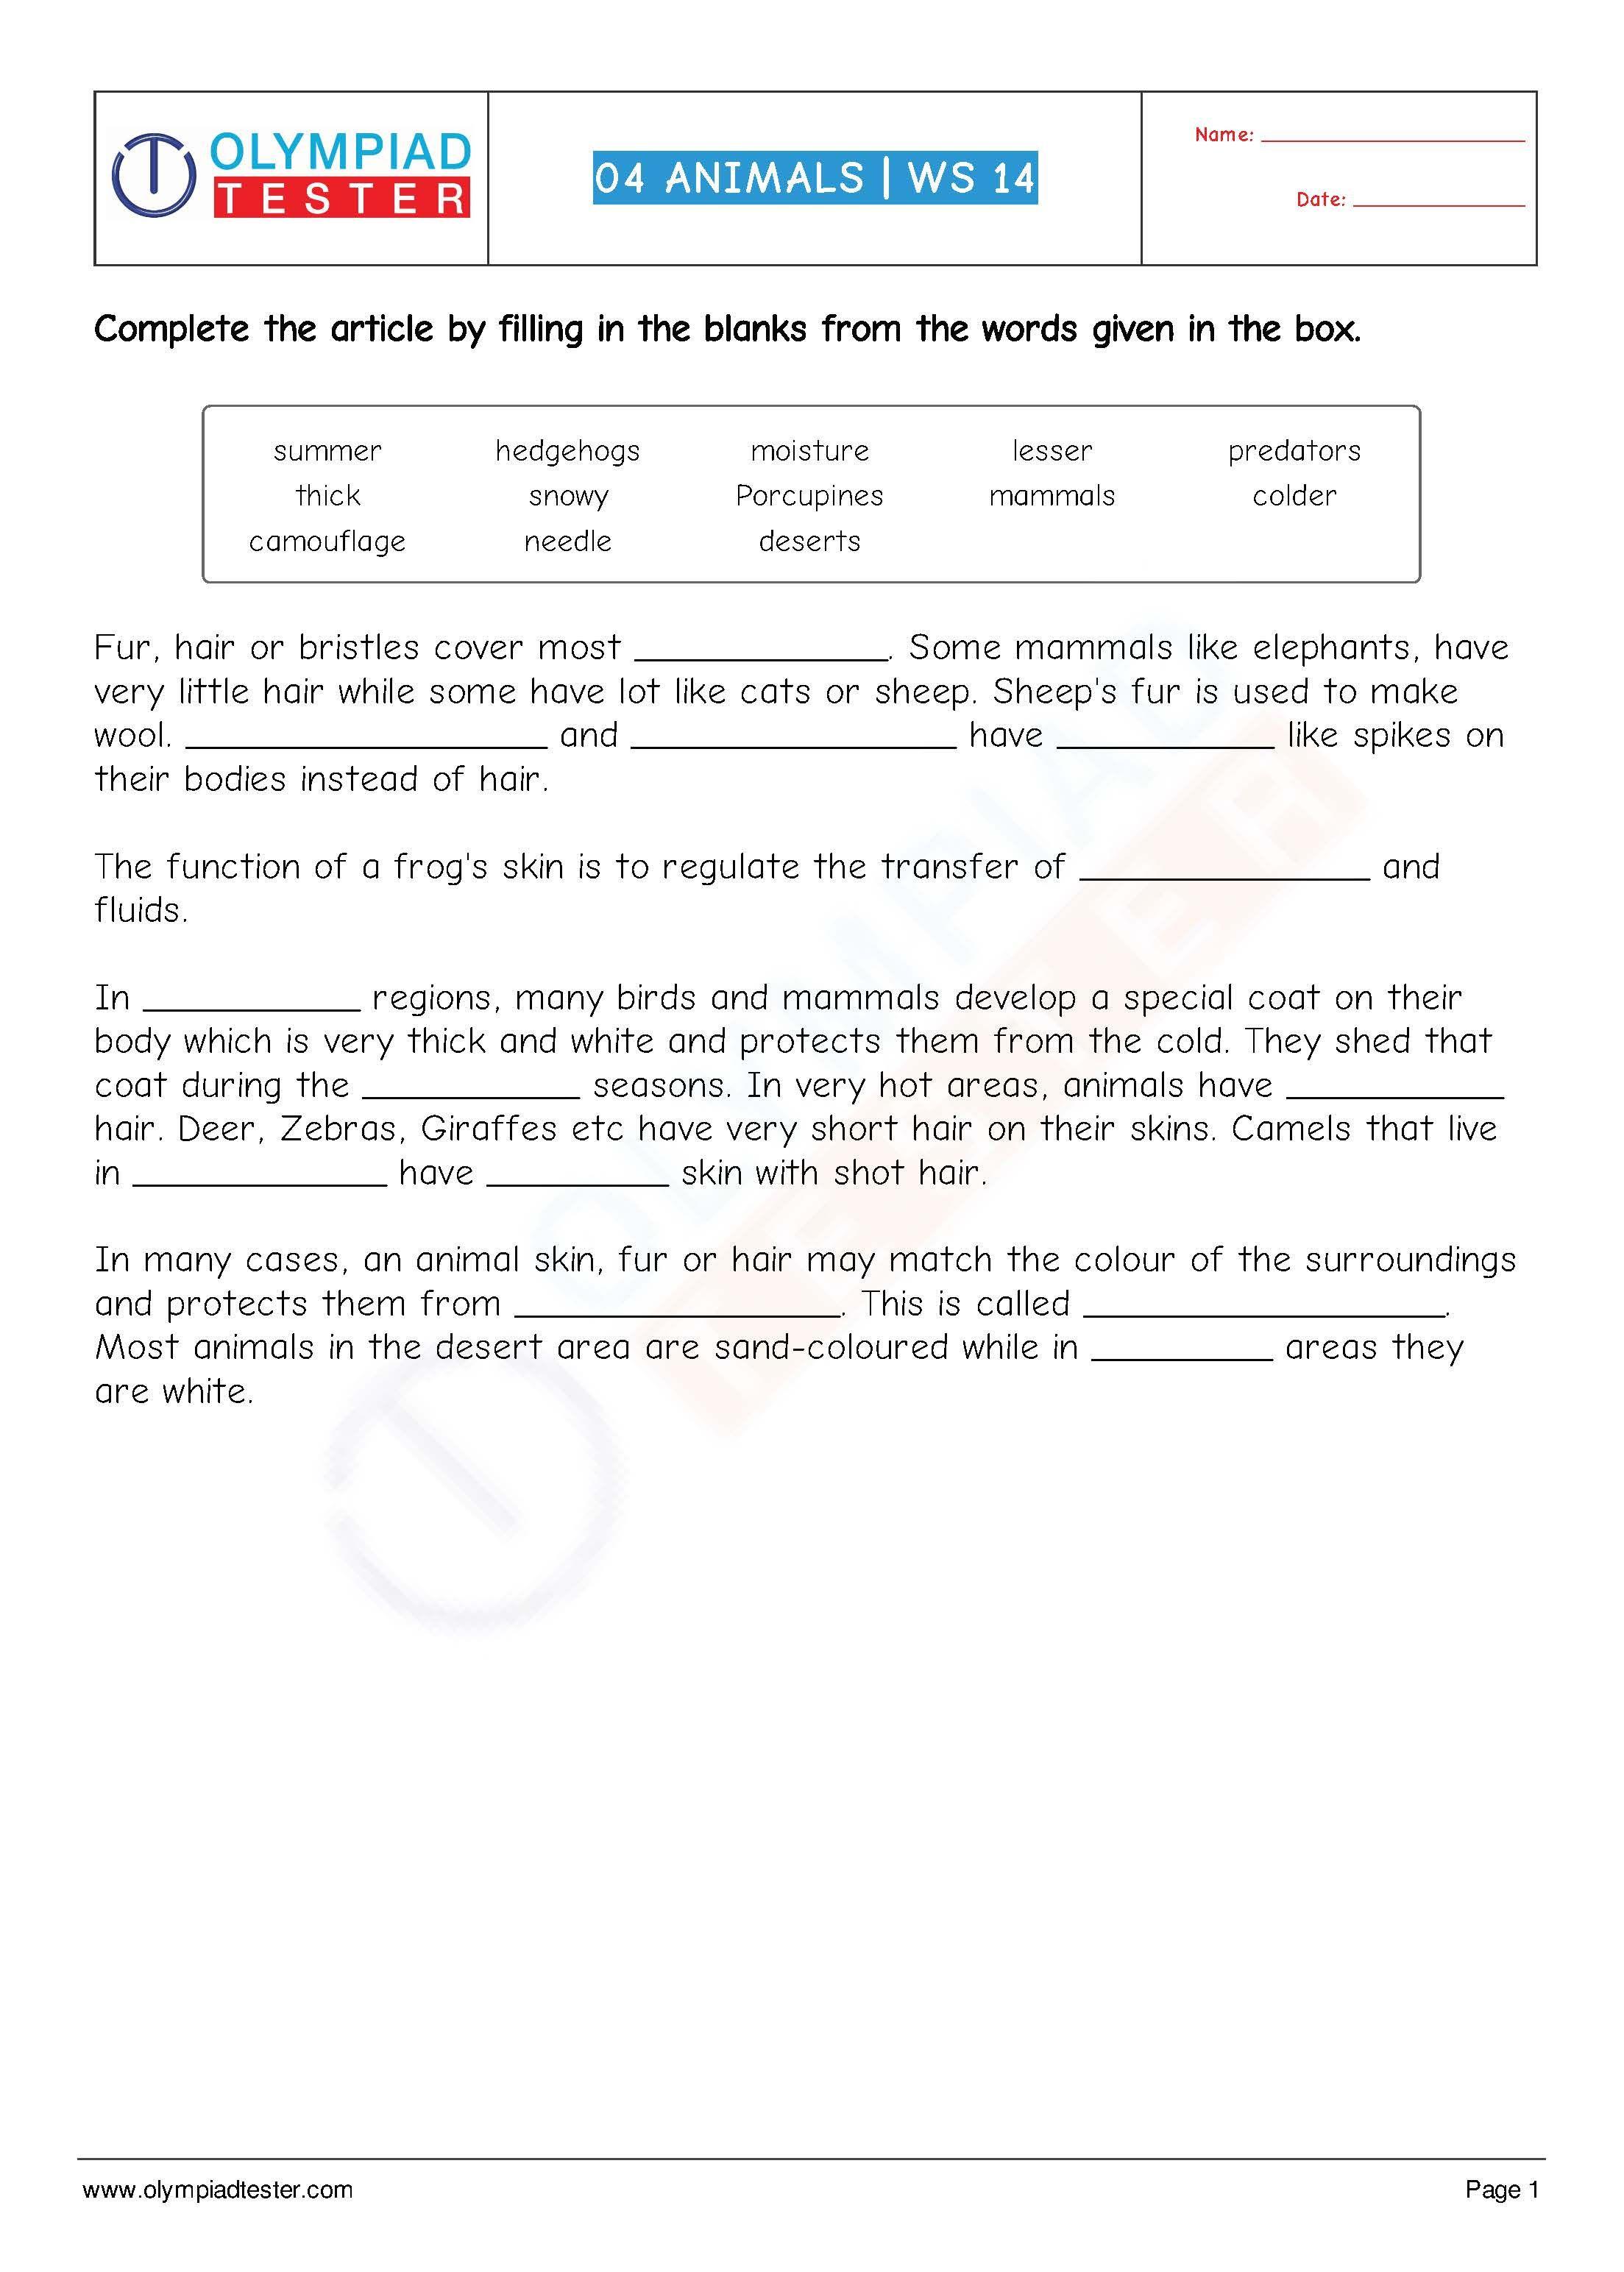 Download This Printable Grade 4 Science Worksheet Cloze